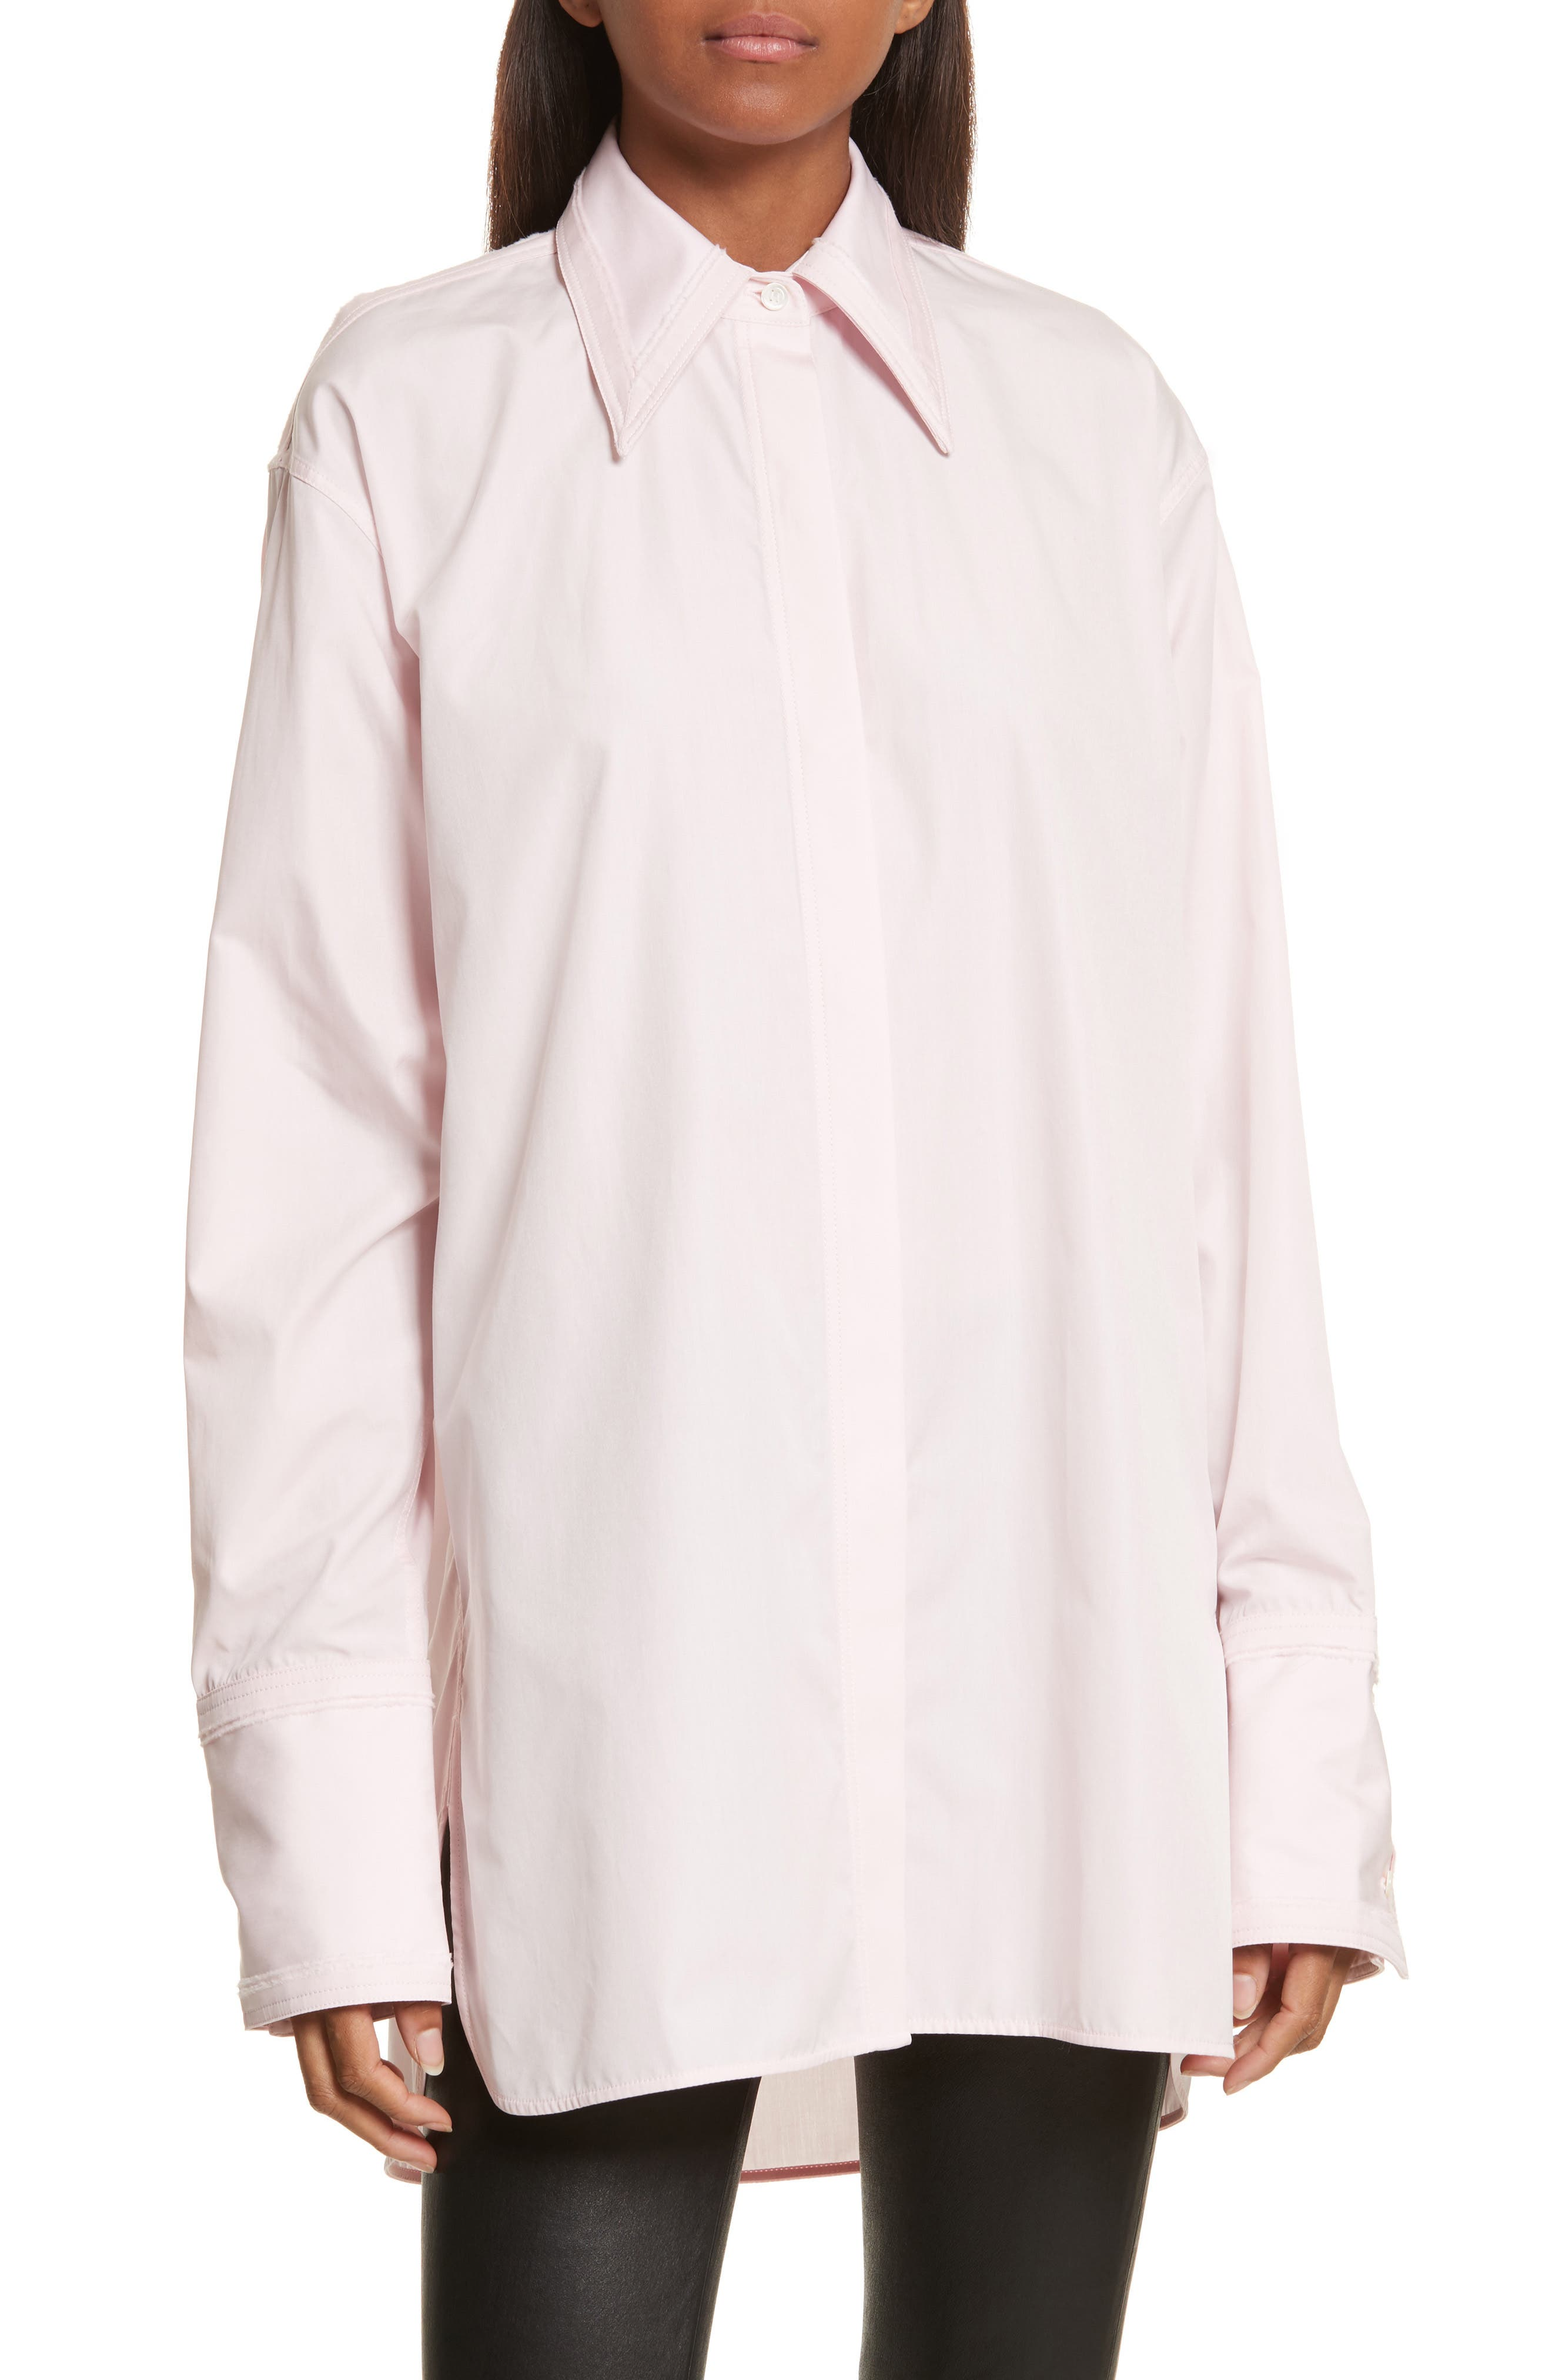 Alternate Image 1 Selected - Helmut Lang Cutout Cotton Poplin Shirt